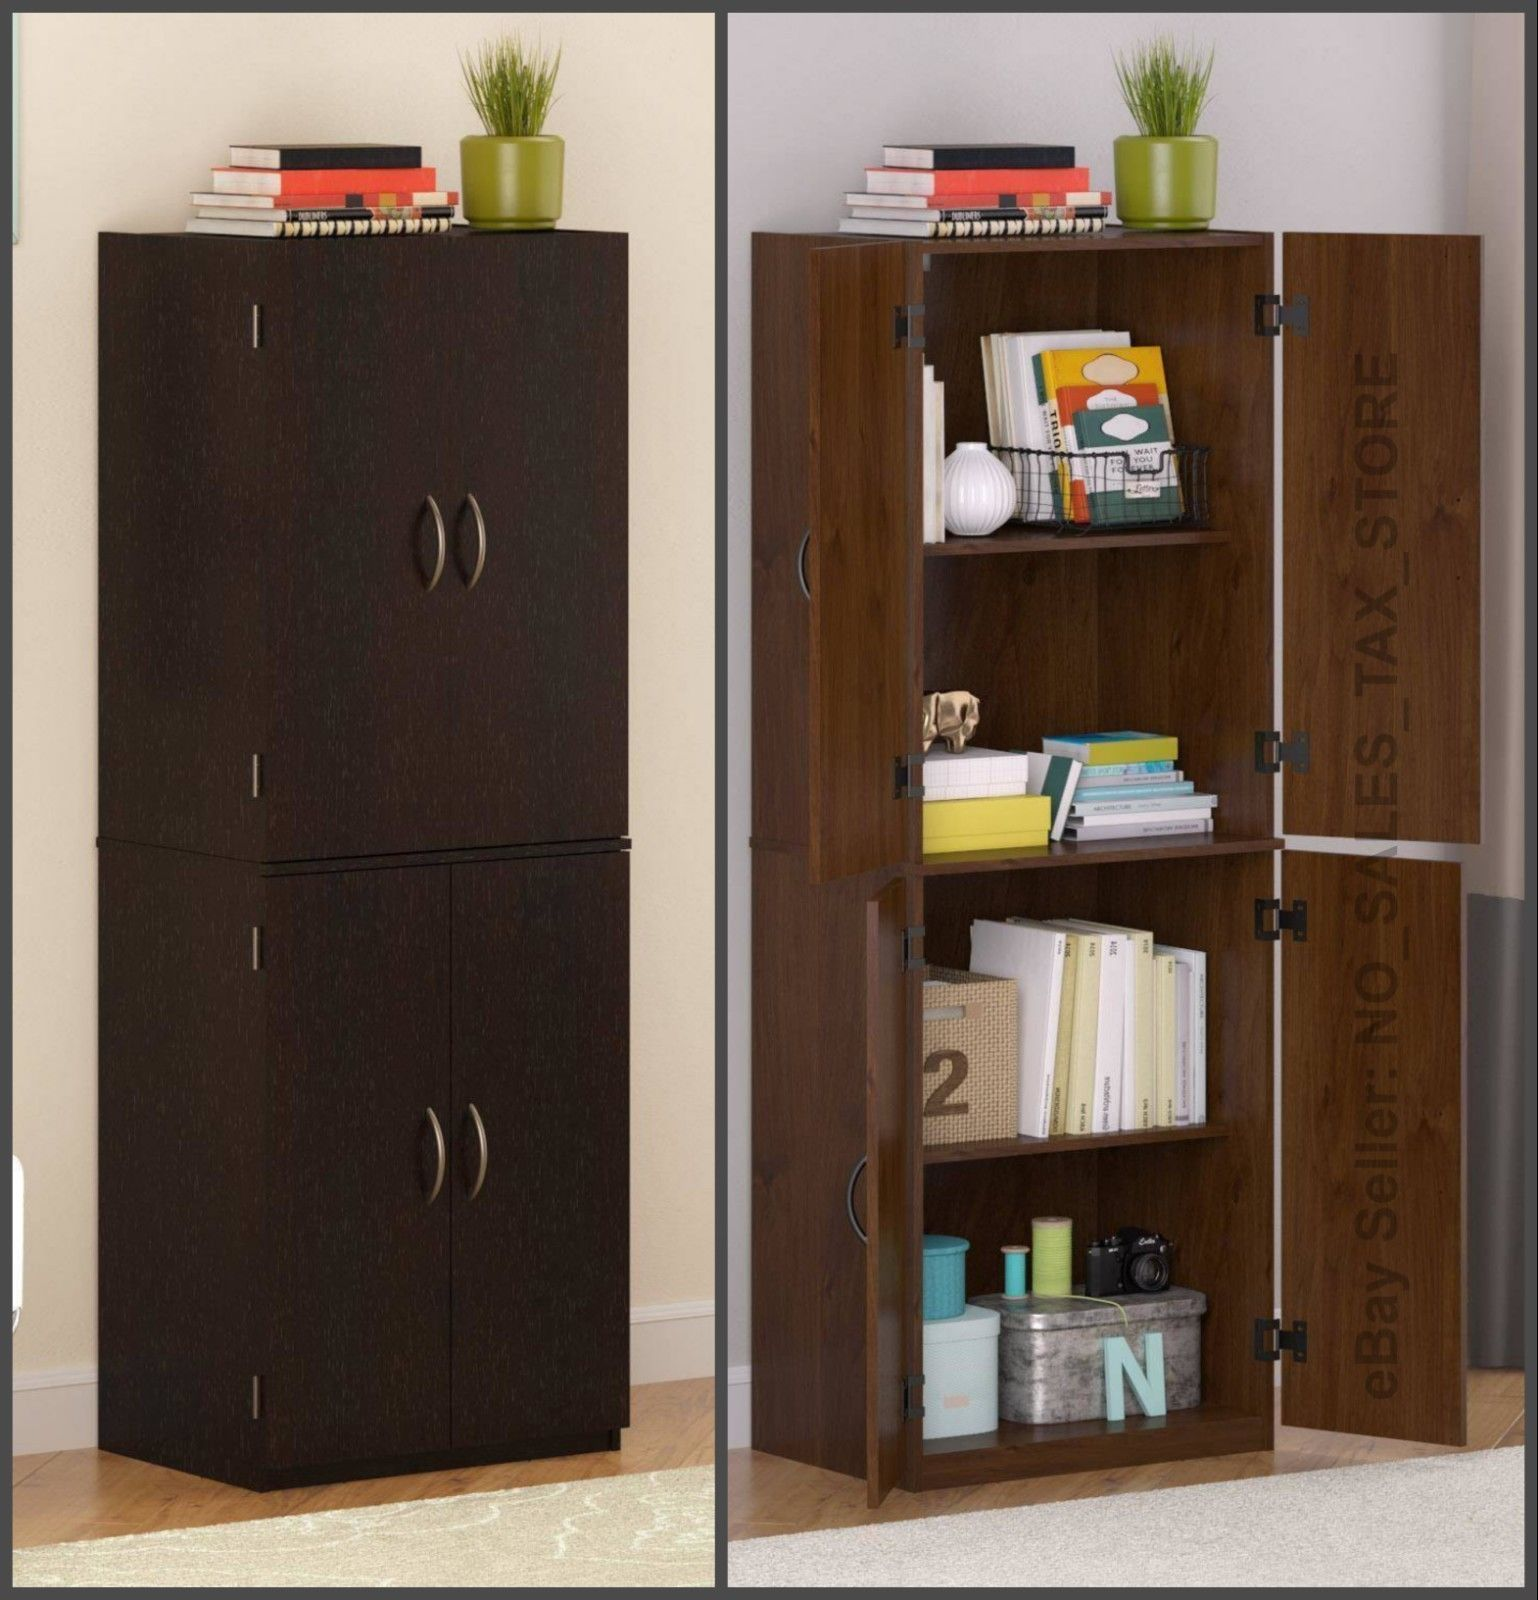 Kitchen Pantry Storage Cabinet Cupboard Organizer Wood Tall Shelves Furniture